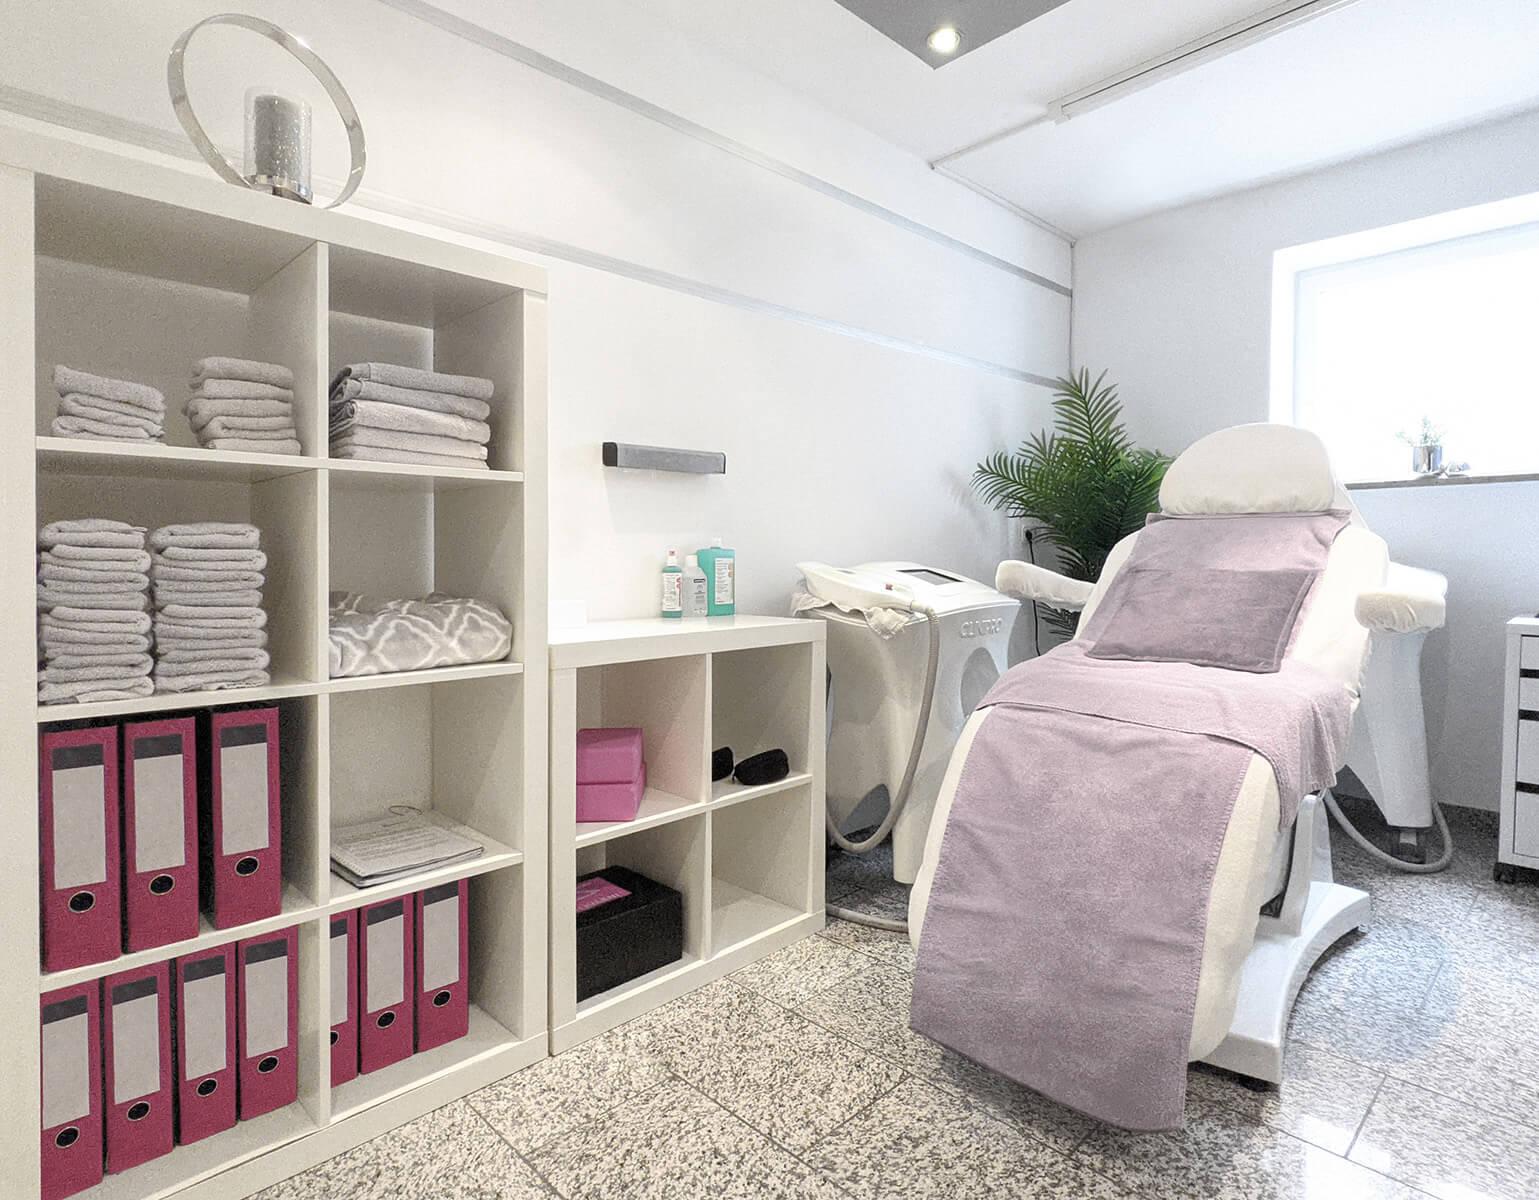 Kosmetikstudio HofBeauty - Behandlungsraum 01